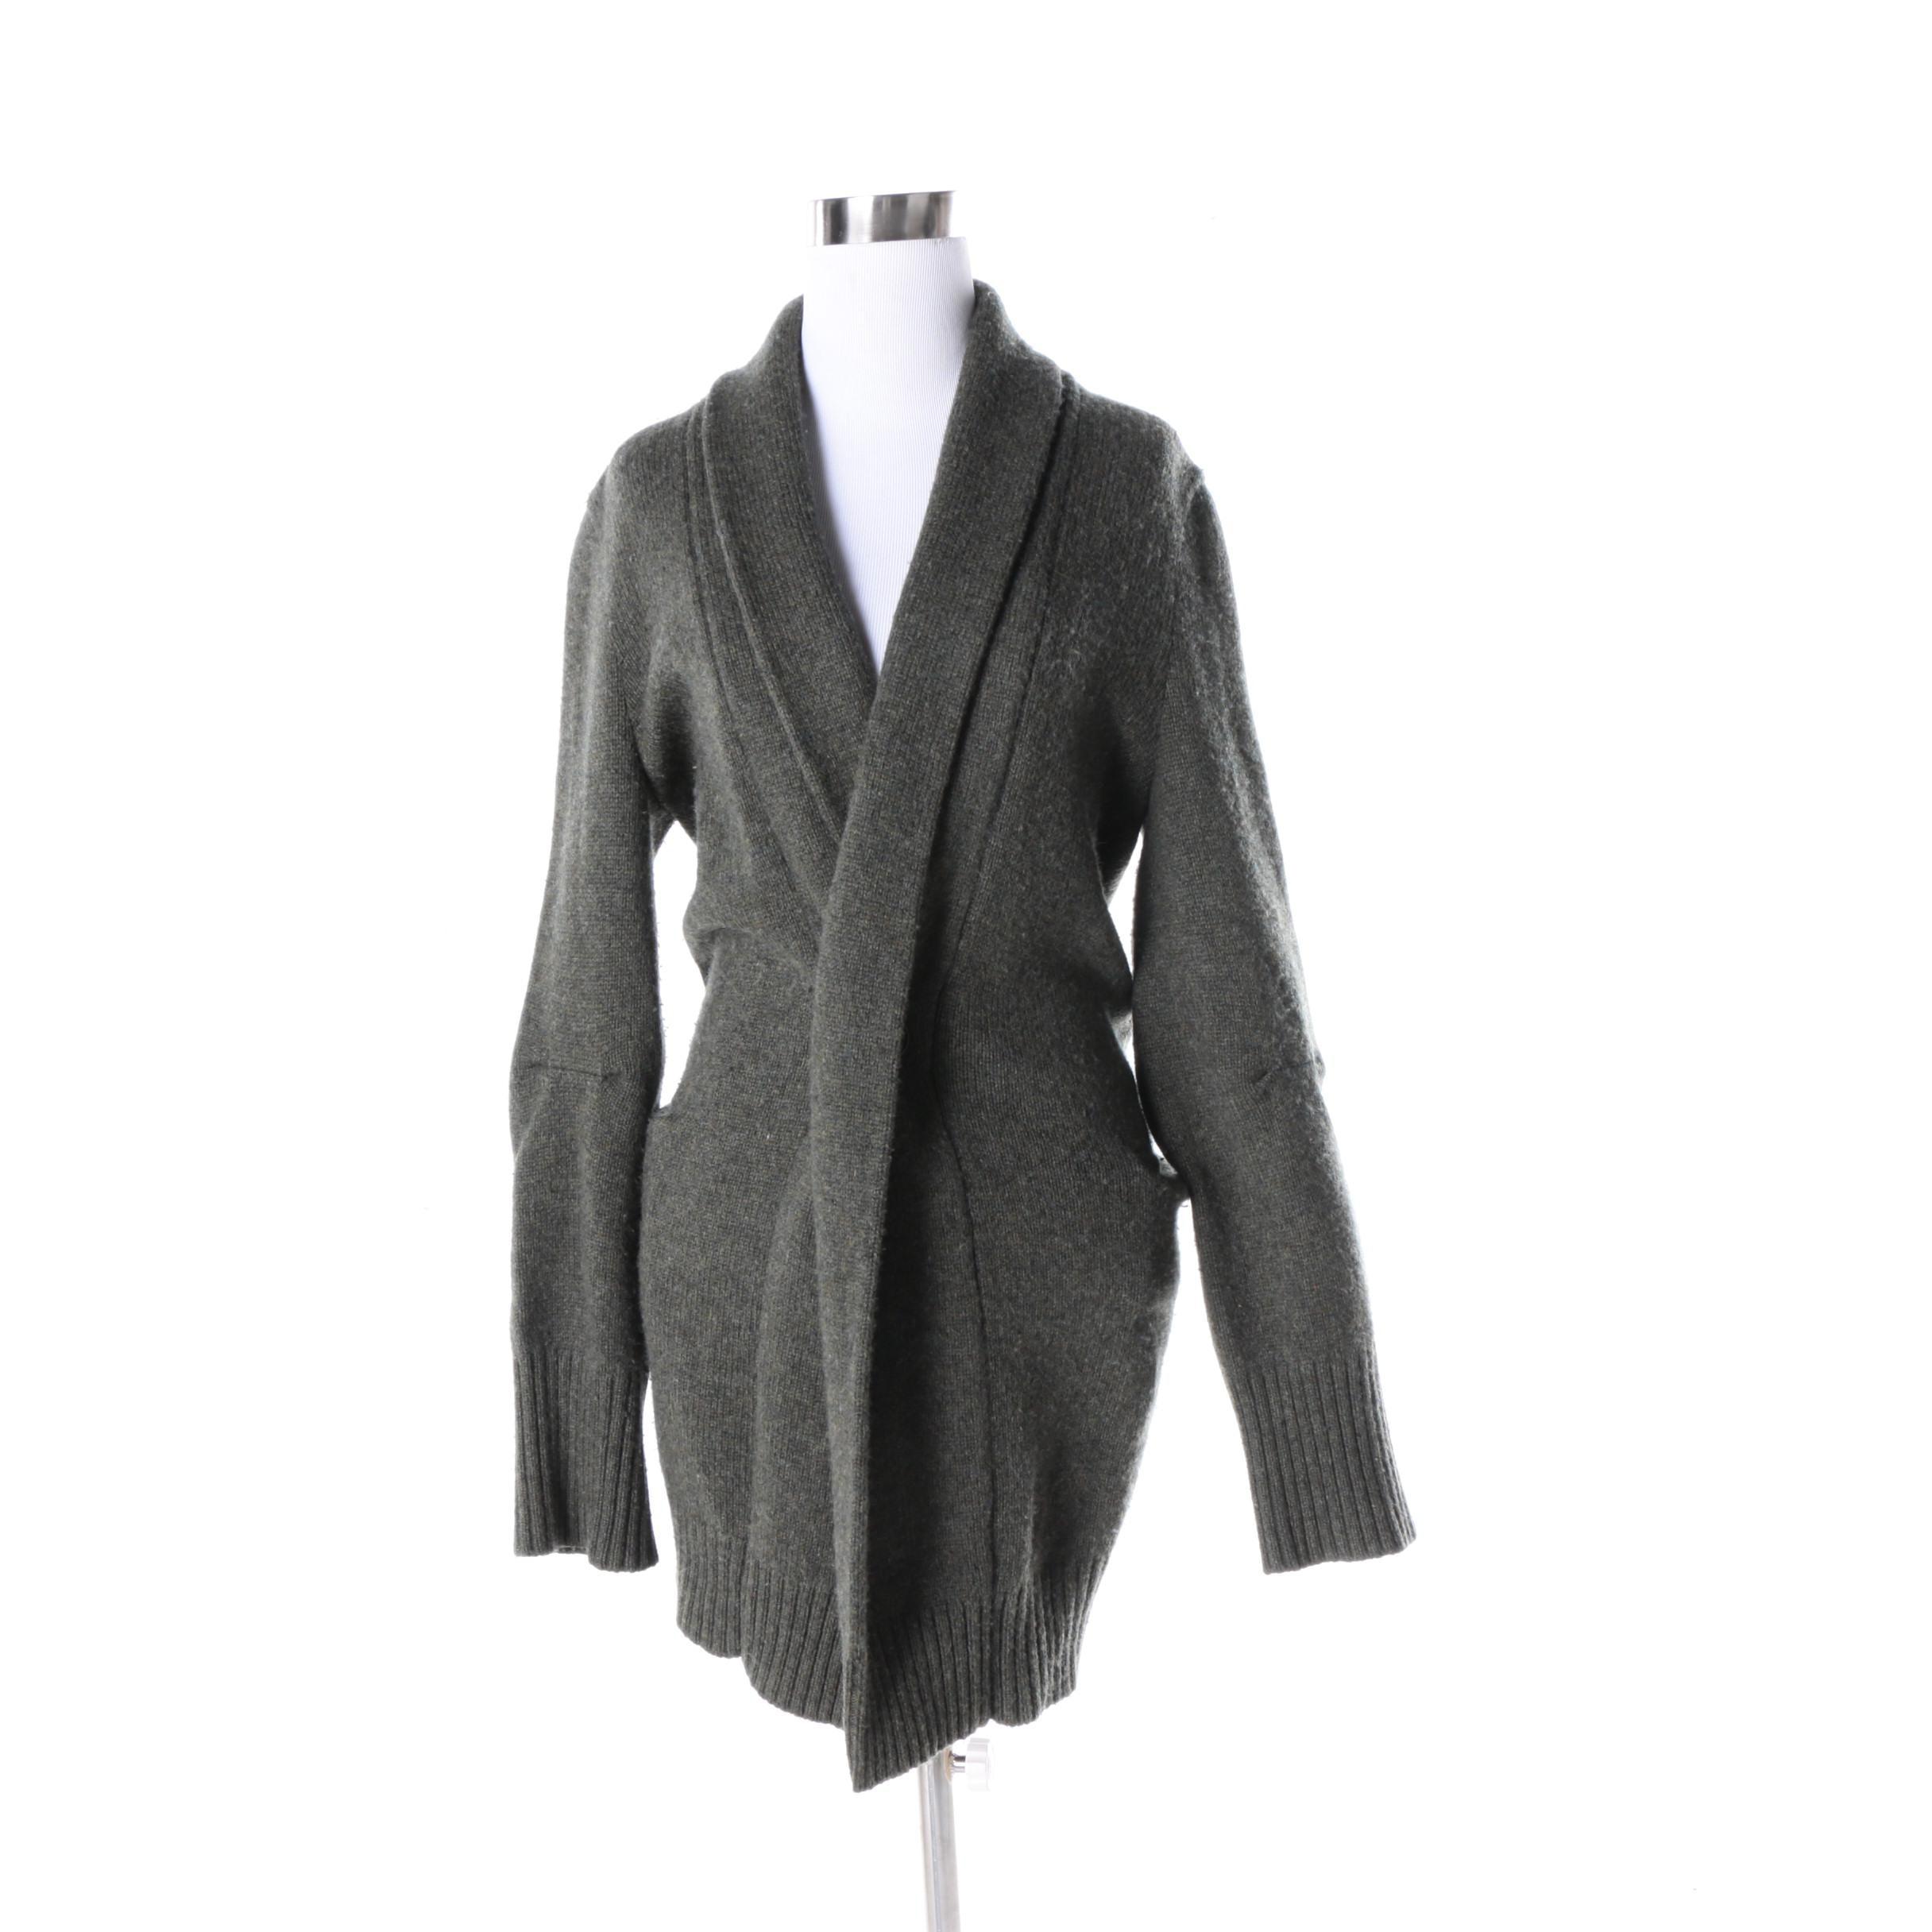 Women's Vivienne Westwood Anglomania Wool Blend Cardigan